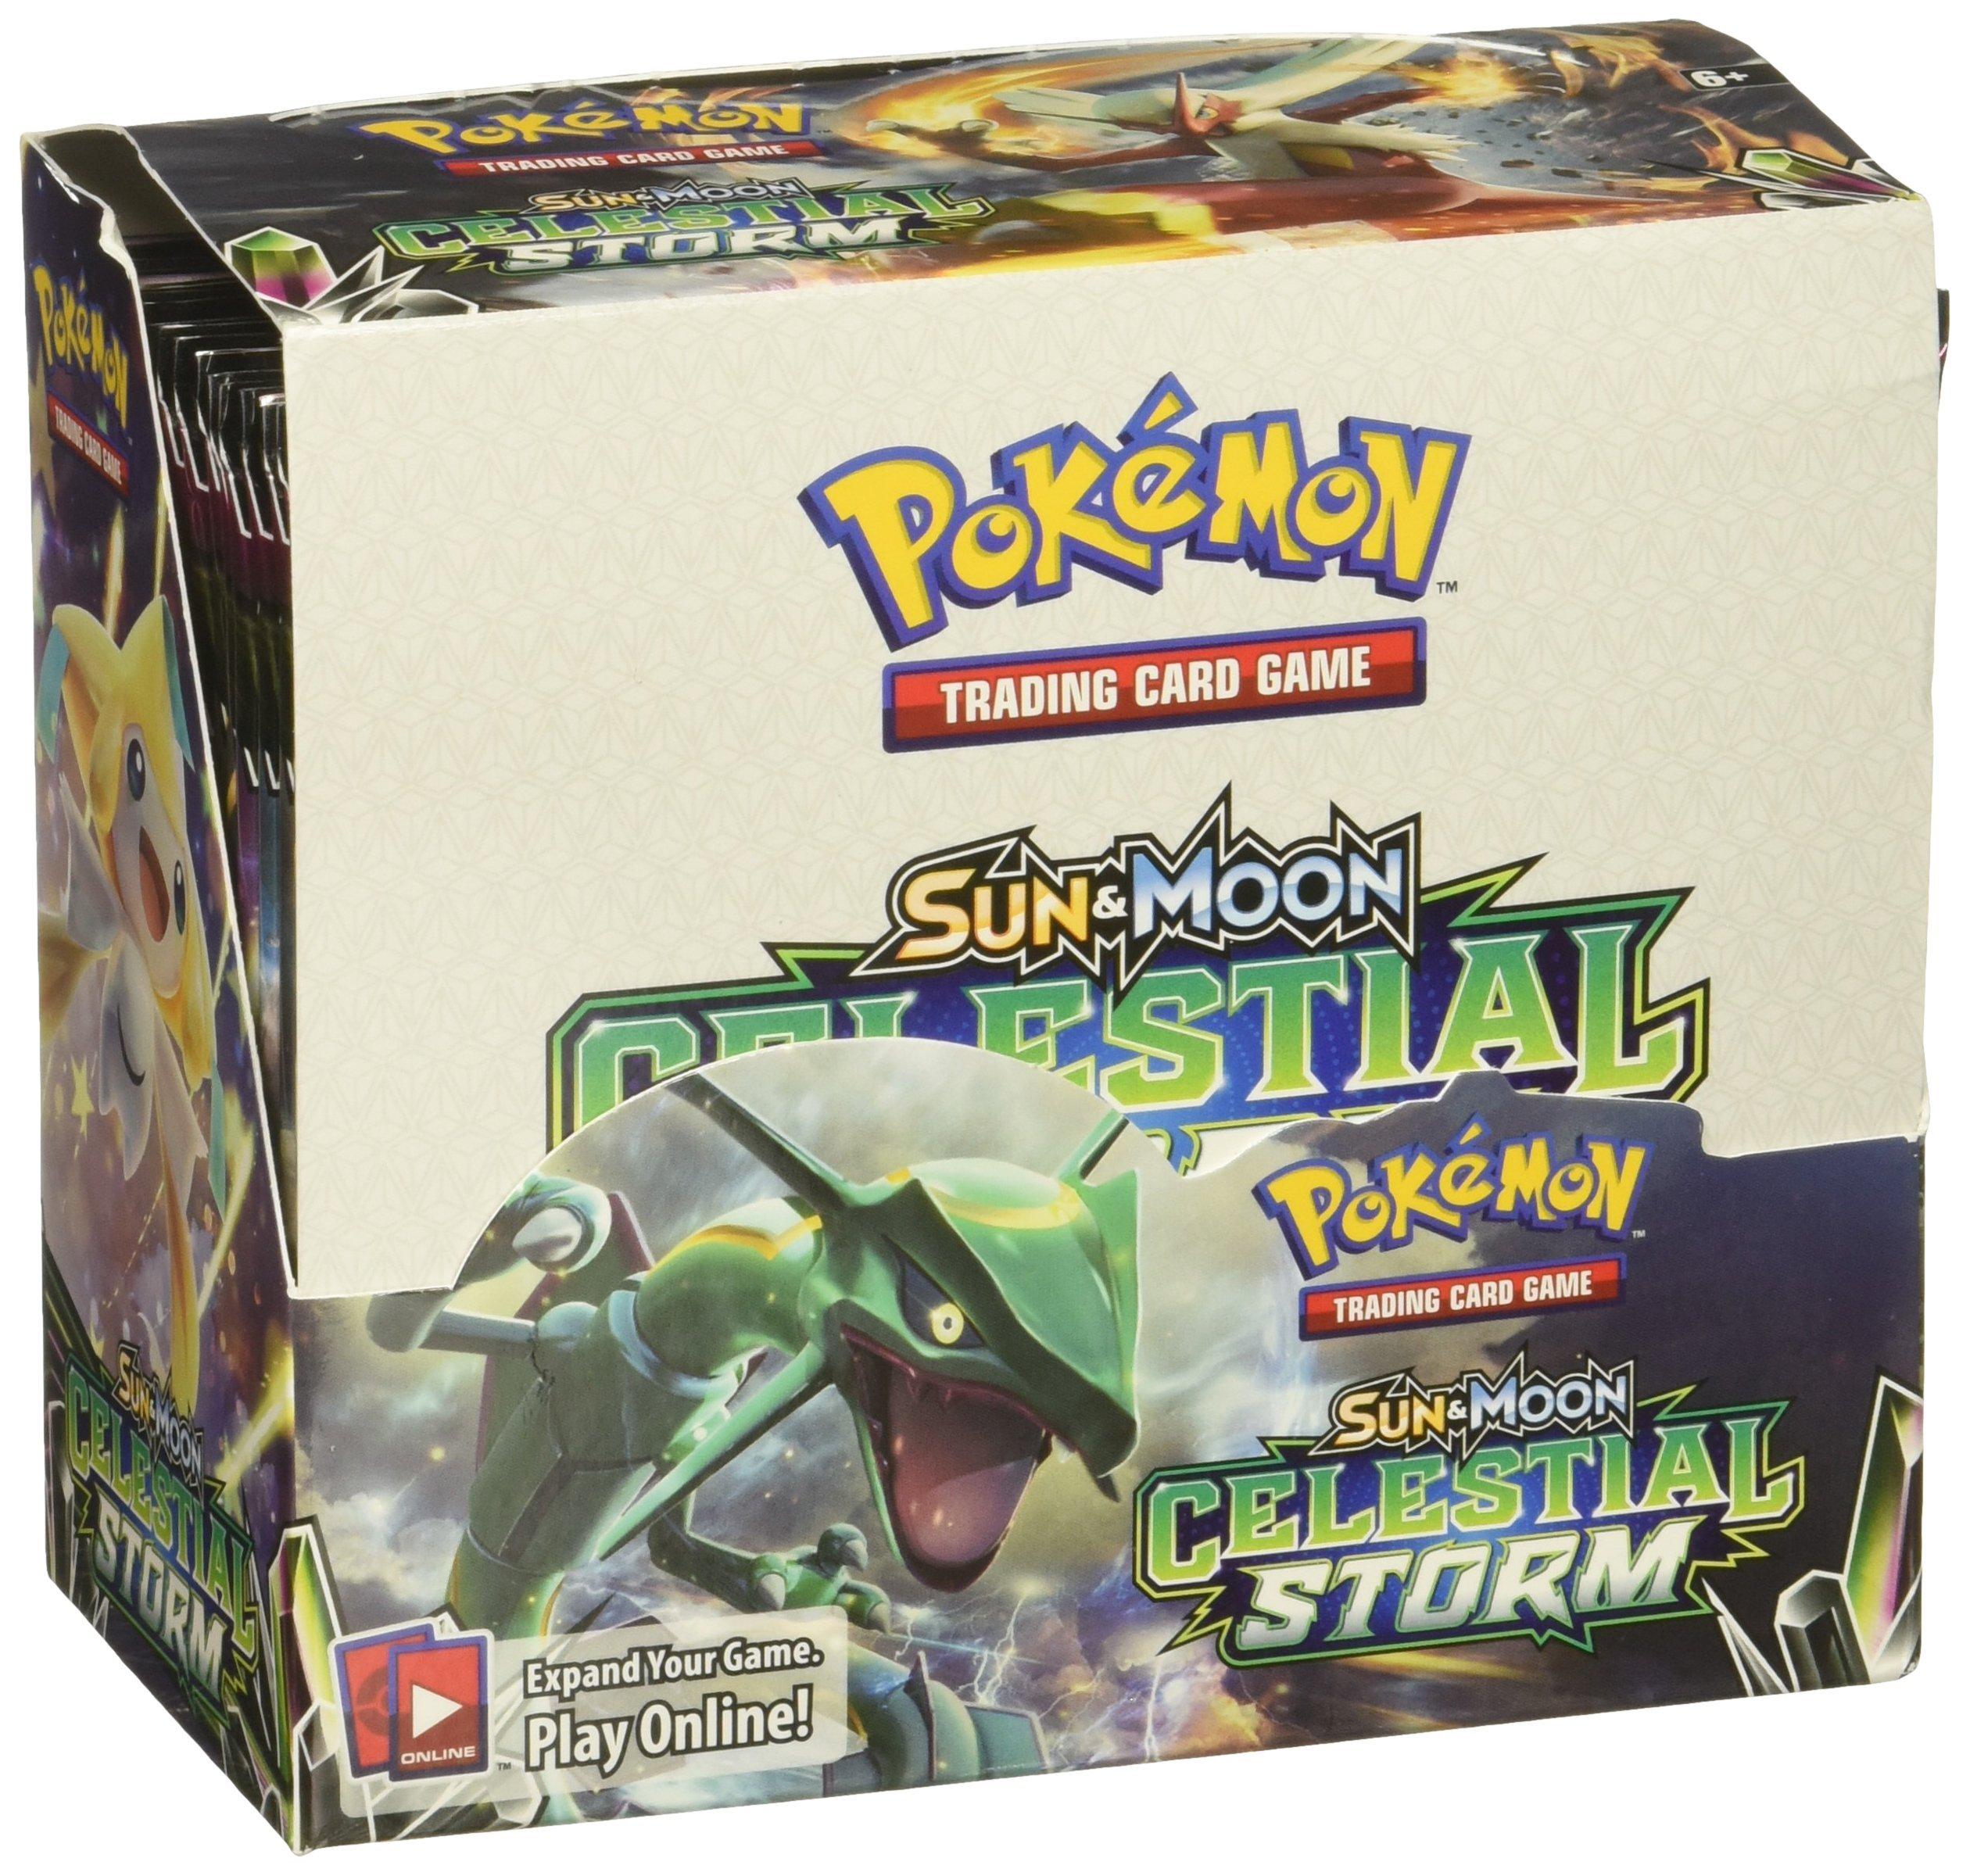 PoKéMoN POK81438 TCG: Sun and Moon 7 Celestial Storm Booster Box: Amazon.es: Juguetes y juegos